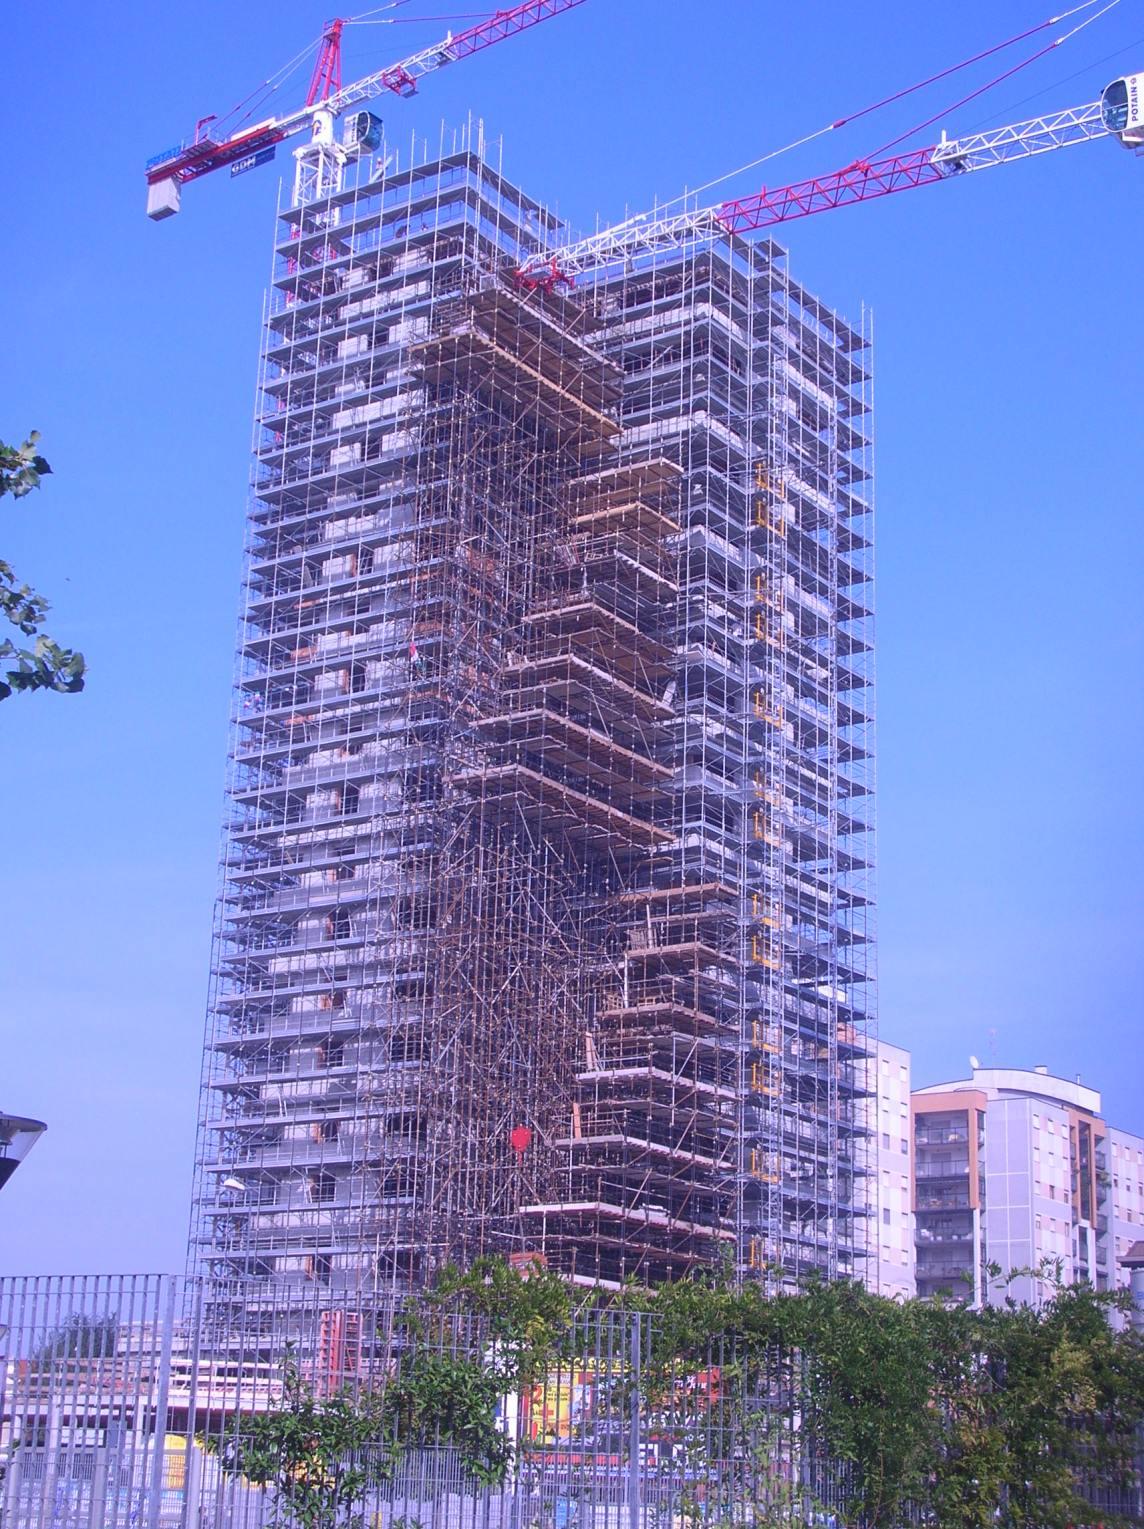 Grattacielo Via Trasimeno Milano - Gruppo Di Falco Ponteggi